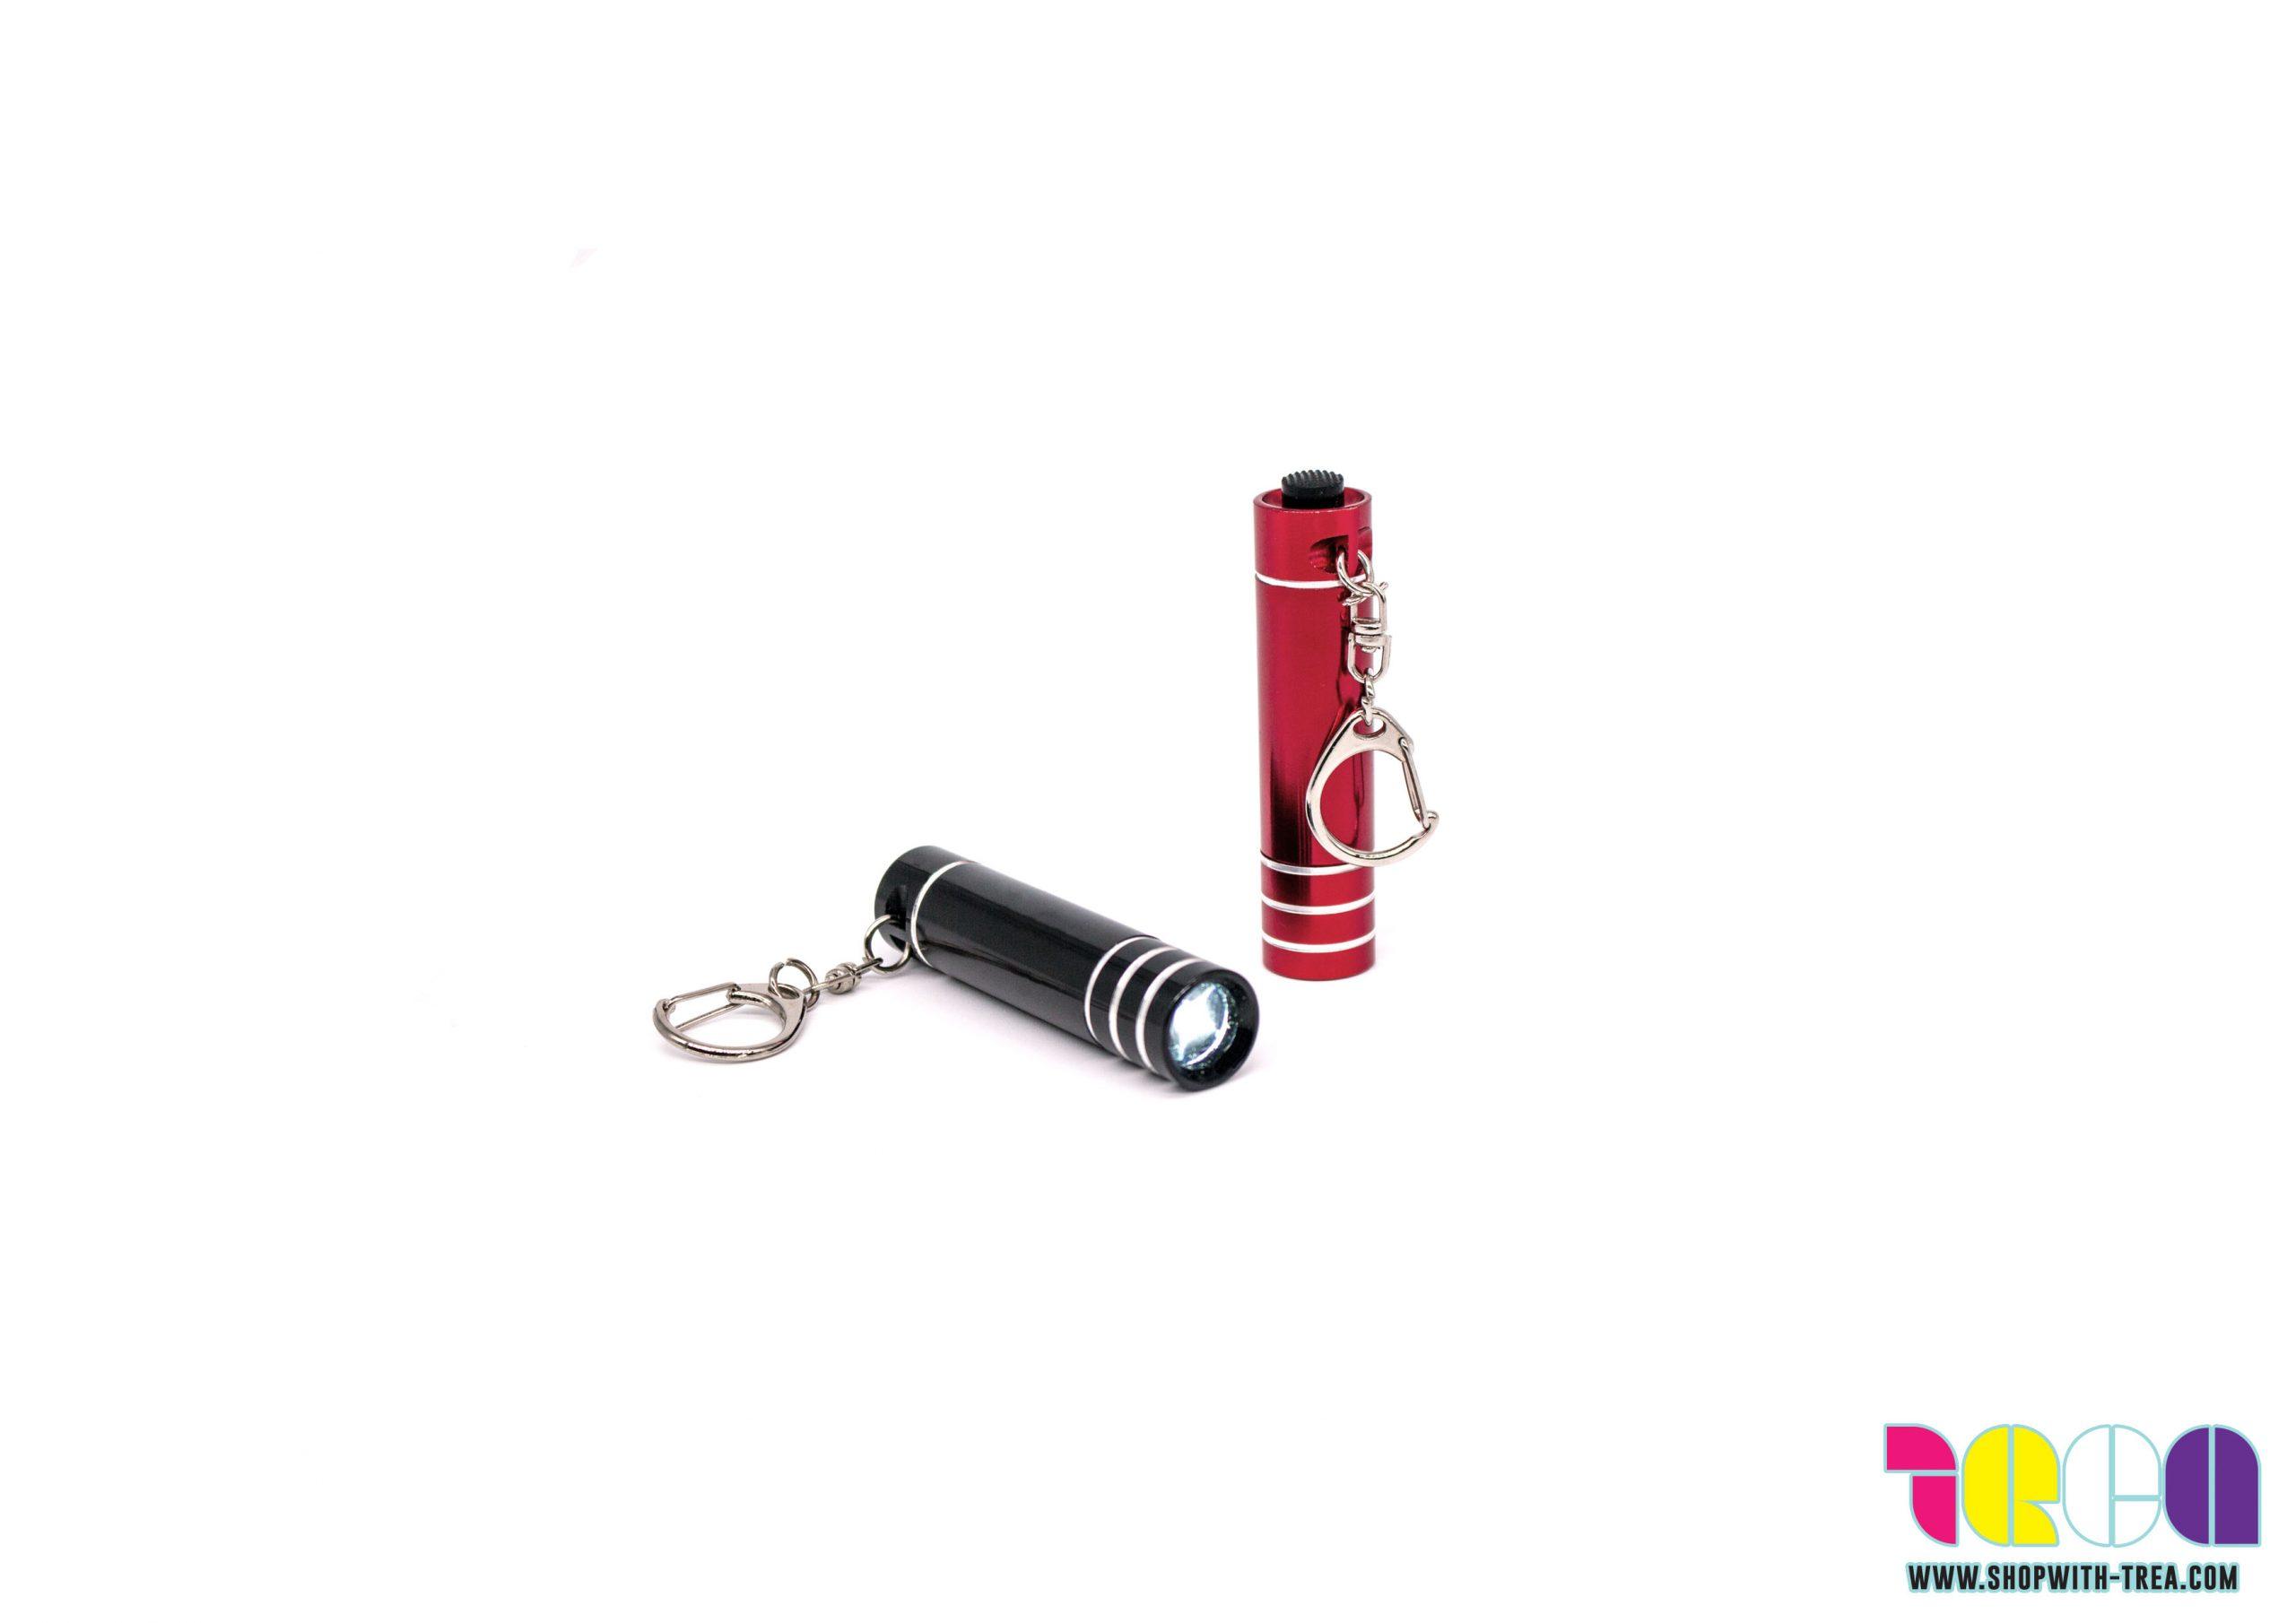 led keychain torchlight